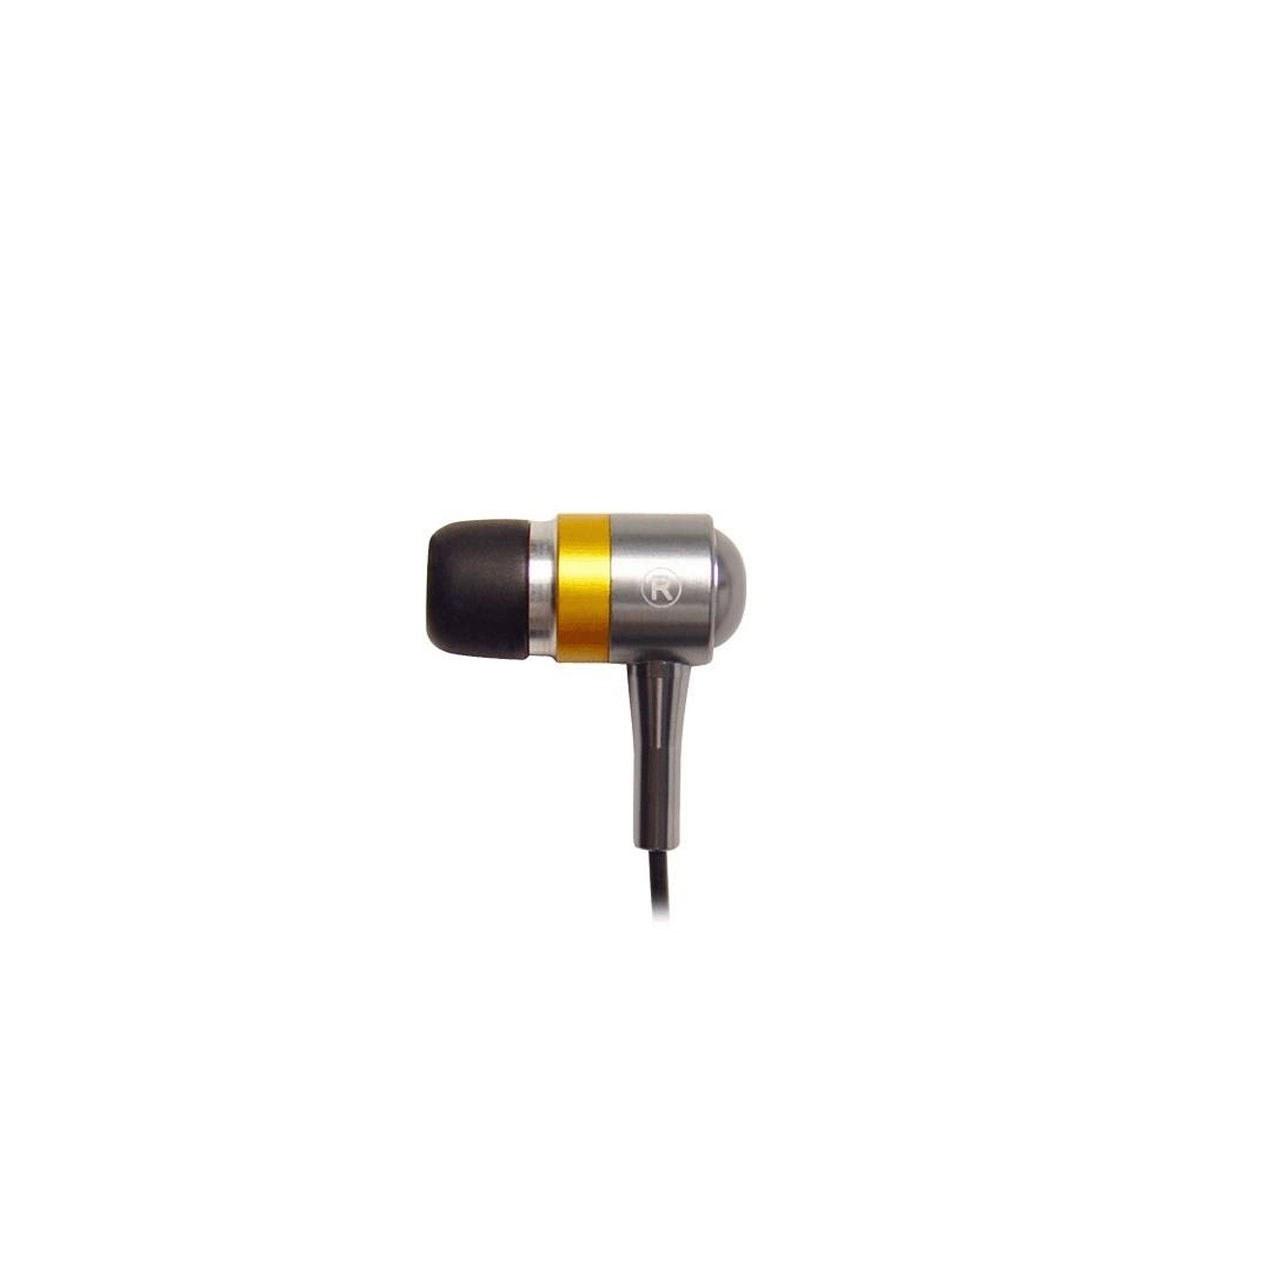 تصویر هدفون سیم دار A4TECH مدل MK-610 A4TECH Wired Headphone Model MK-610